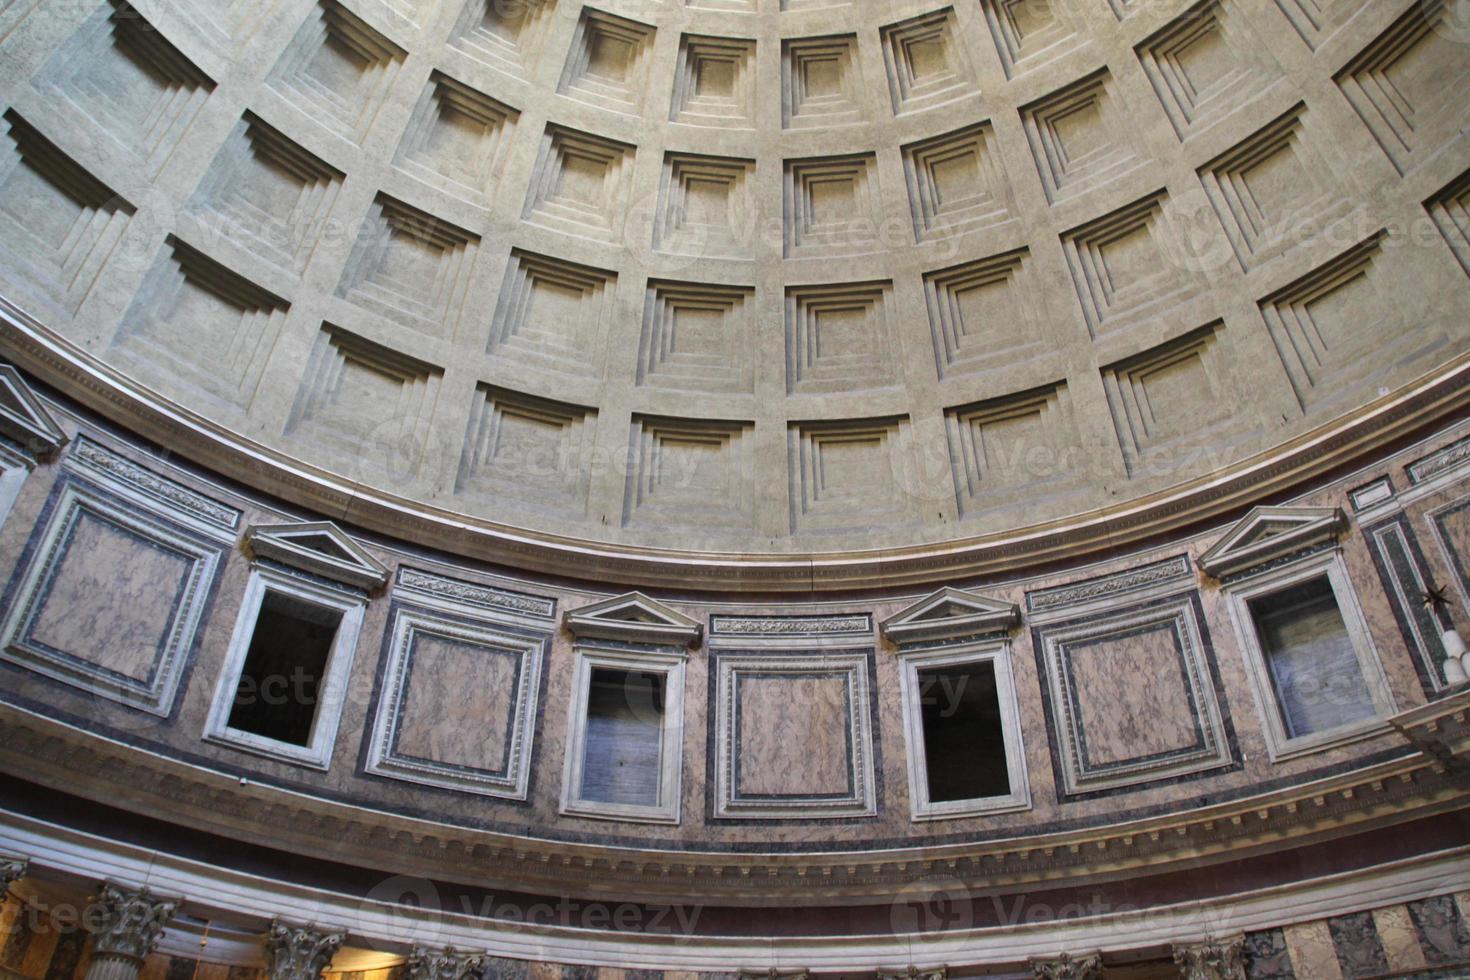 pantheon oculus in rome, Italië. foto